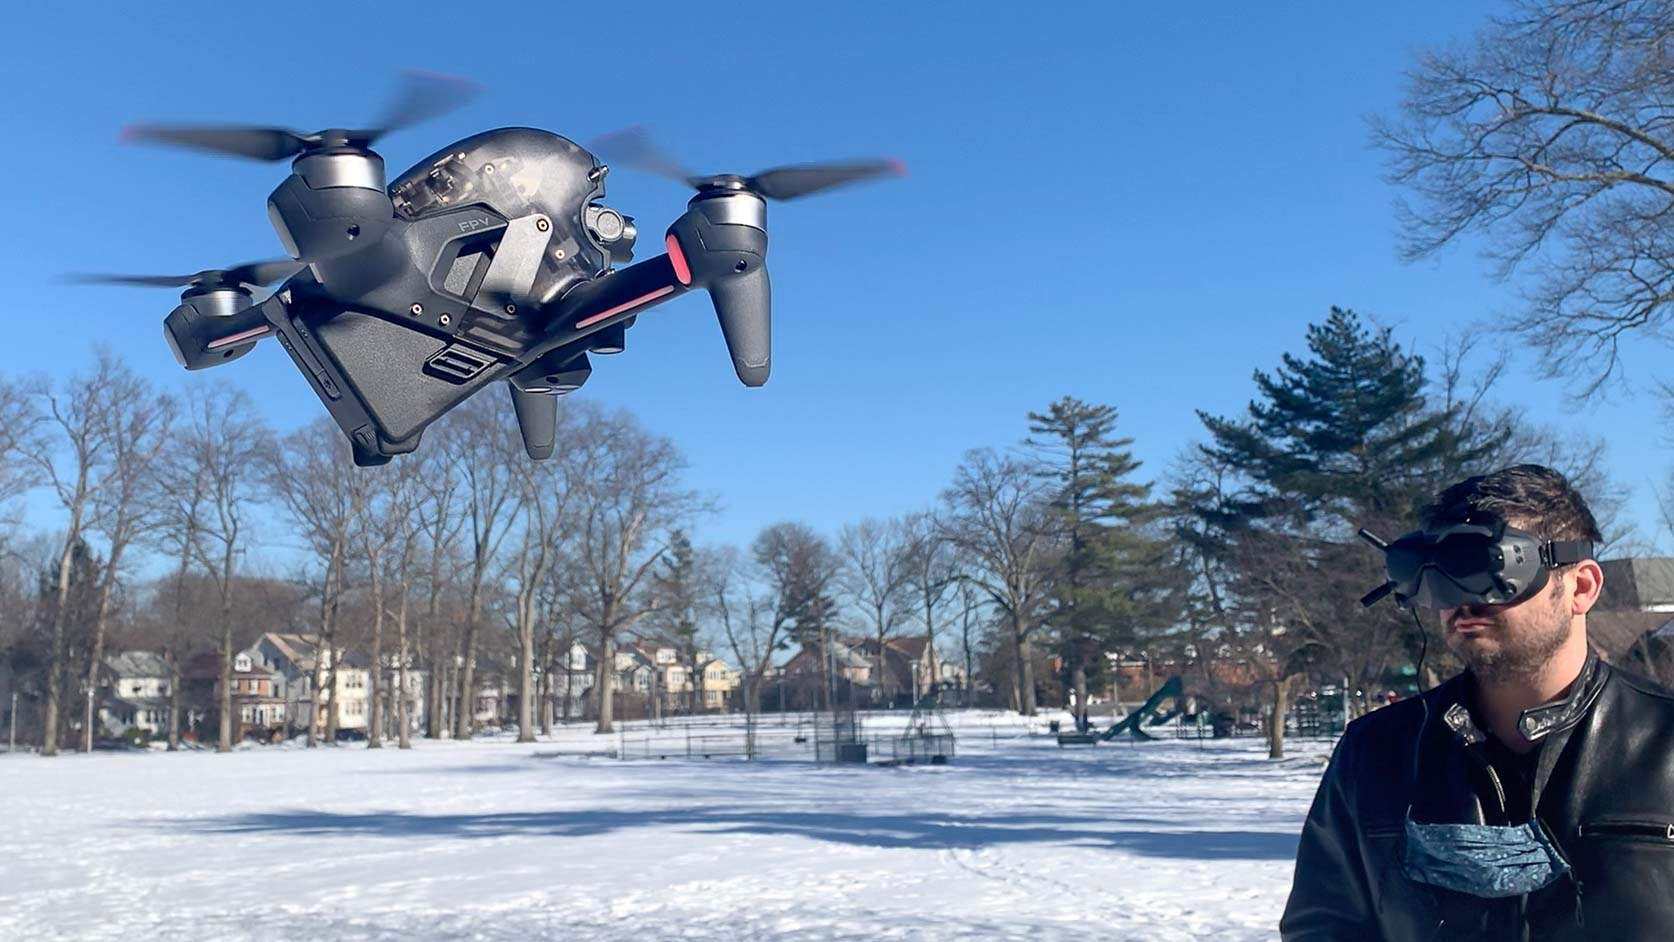 Évaluation du drone DJI FPV